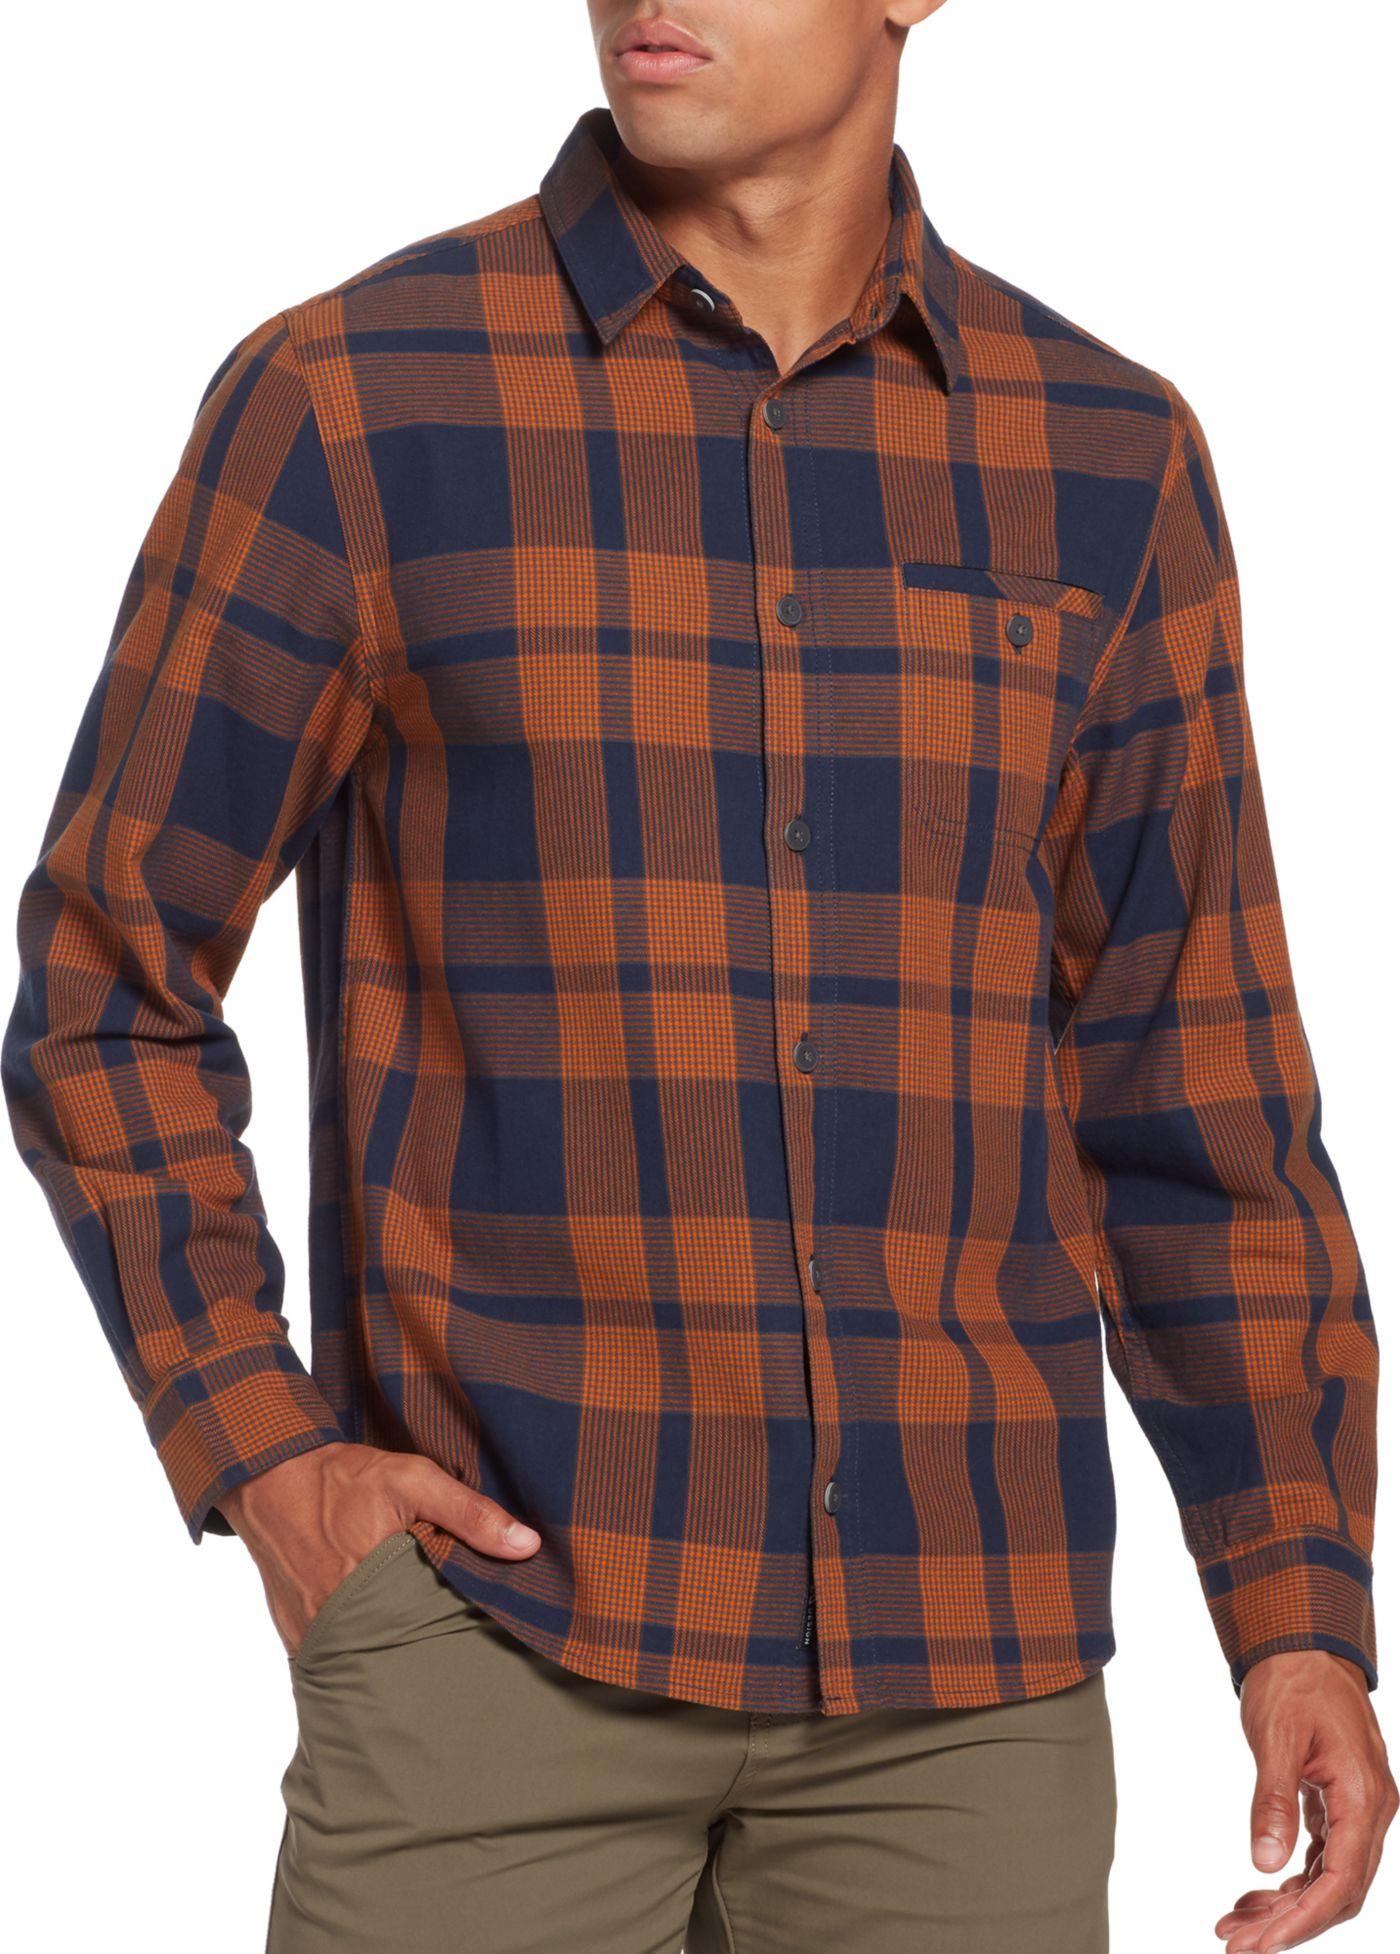 Alpine Design Men's 1962 Vintage Beacon Flannel Shirt